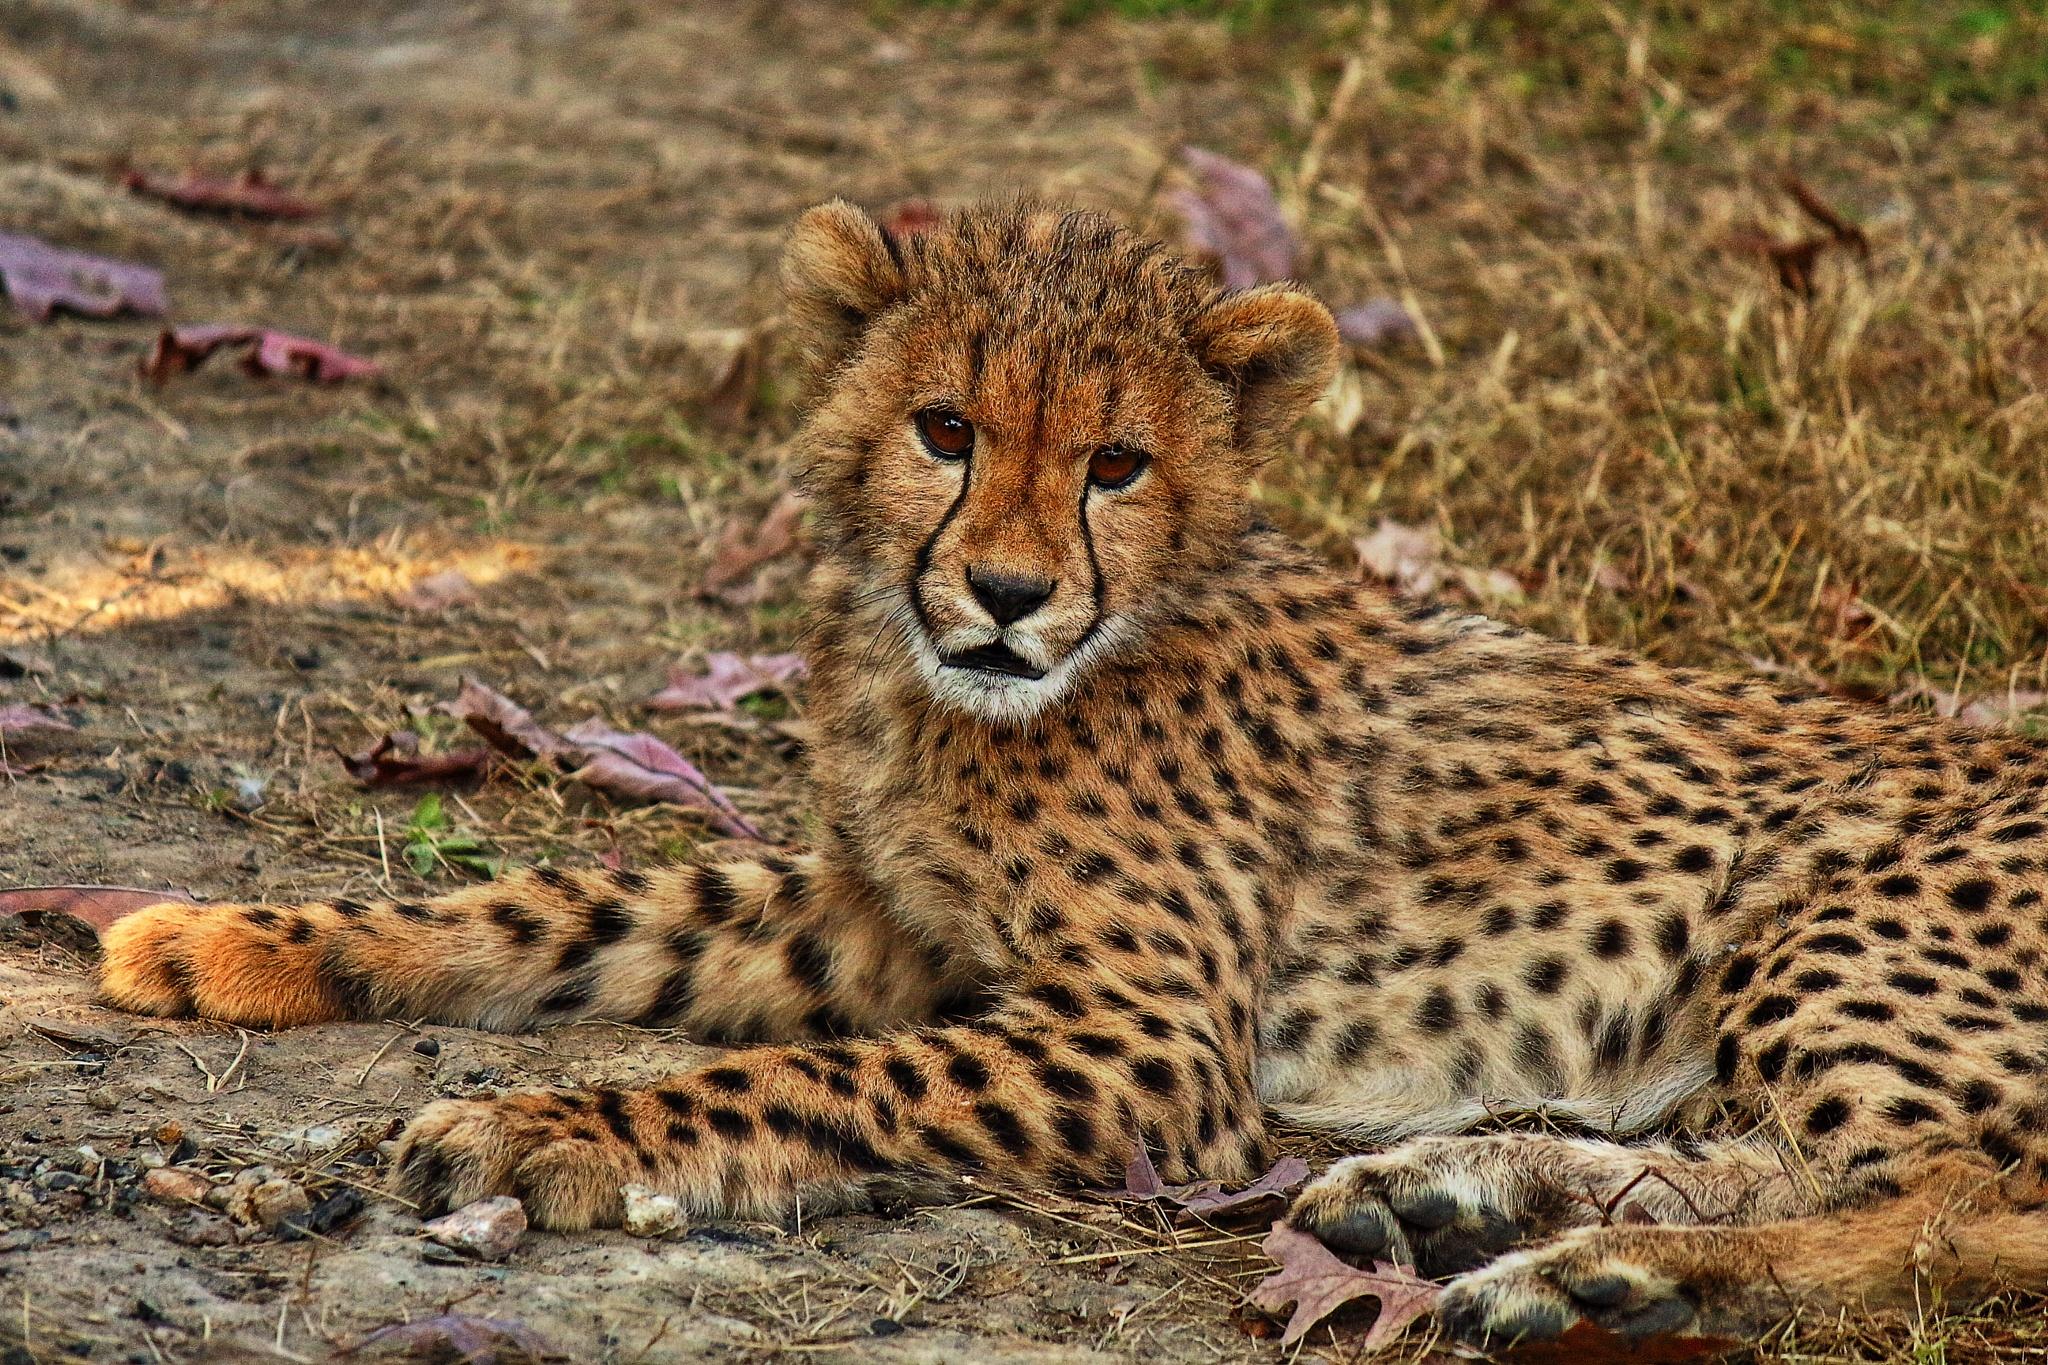 Kumbali the cheetah cub by Clark L. Roberts